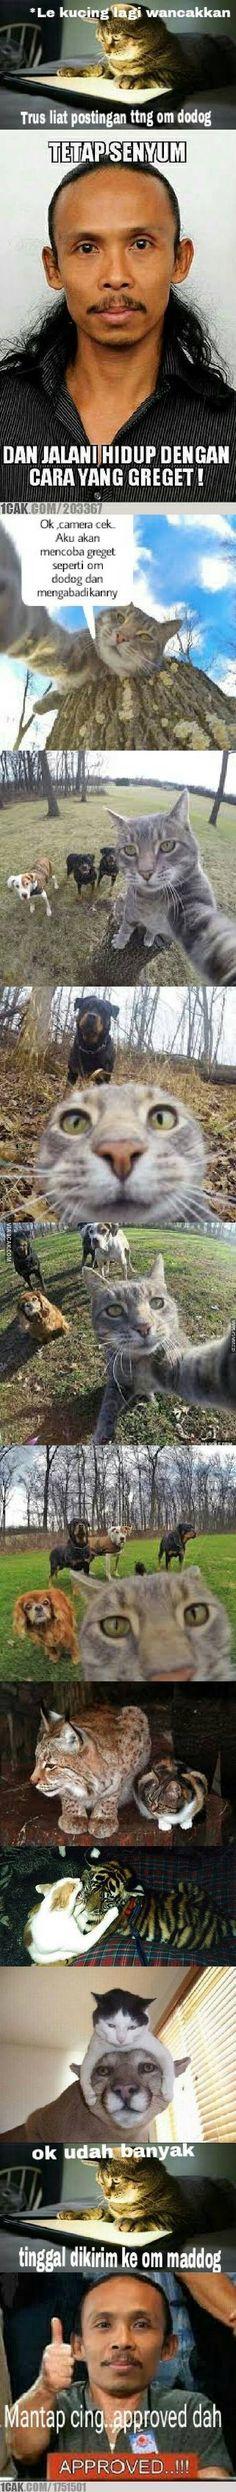 Le kucing : HIDUP SEPERTI OM DODOG... #longpost ??